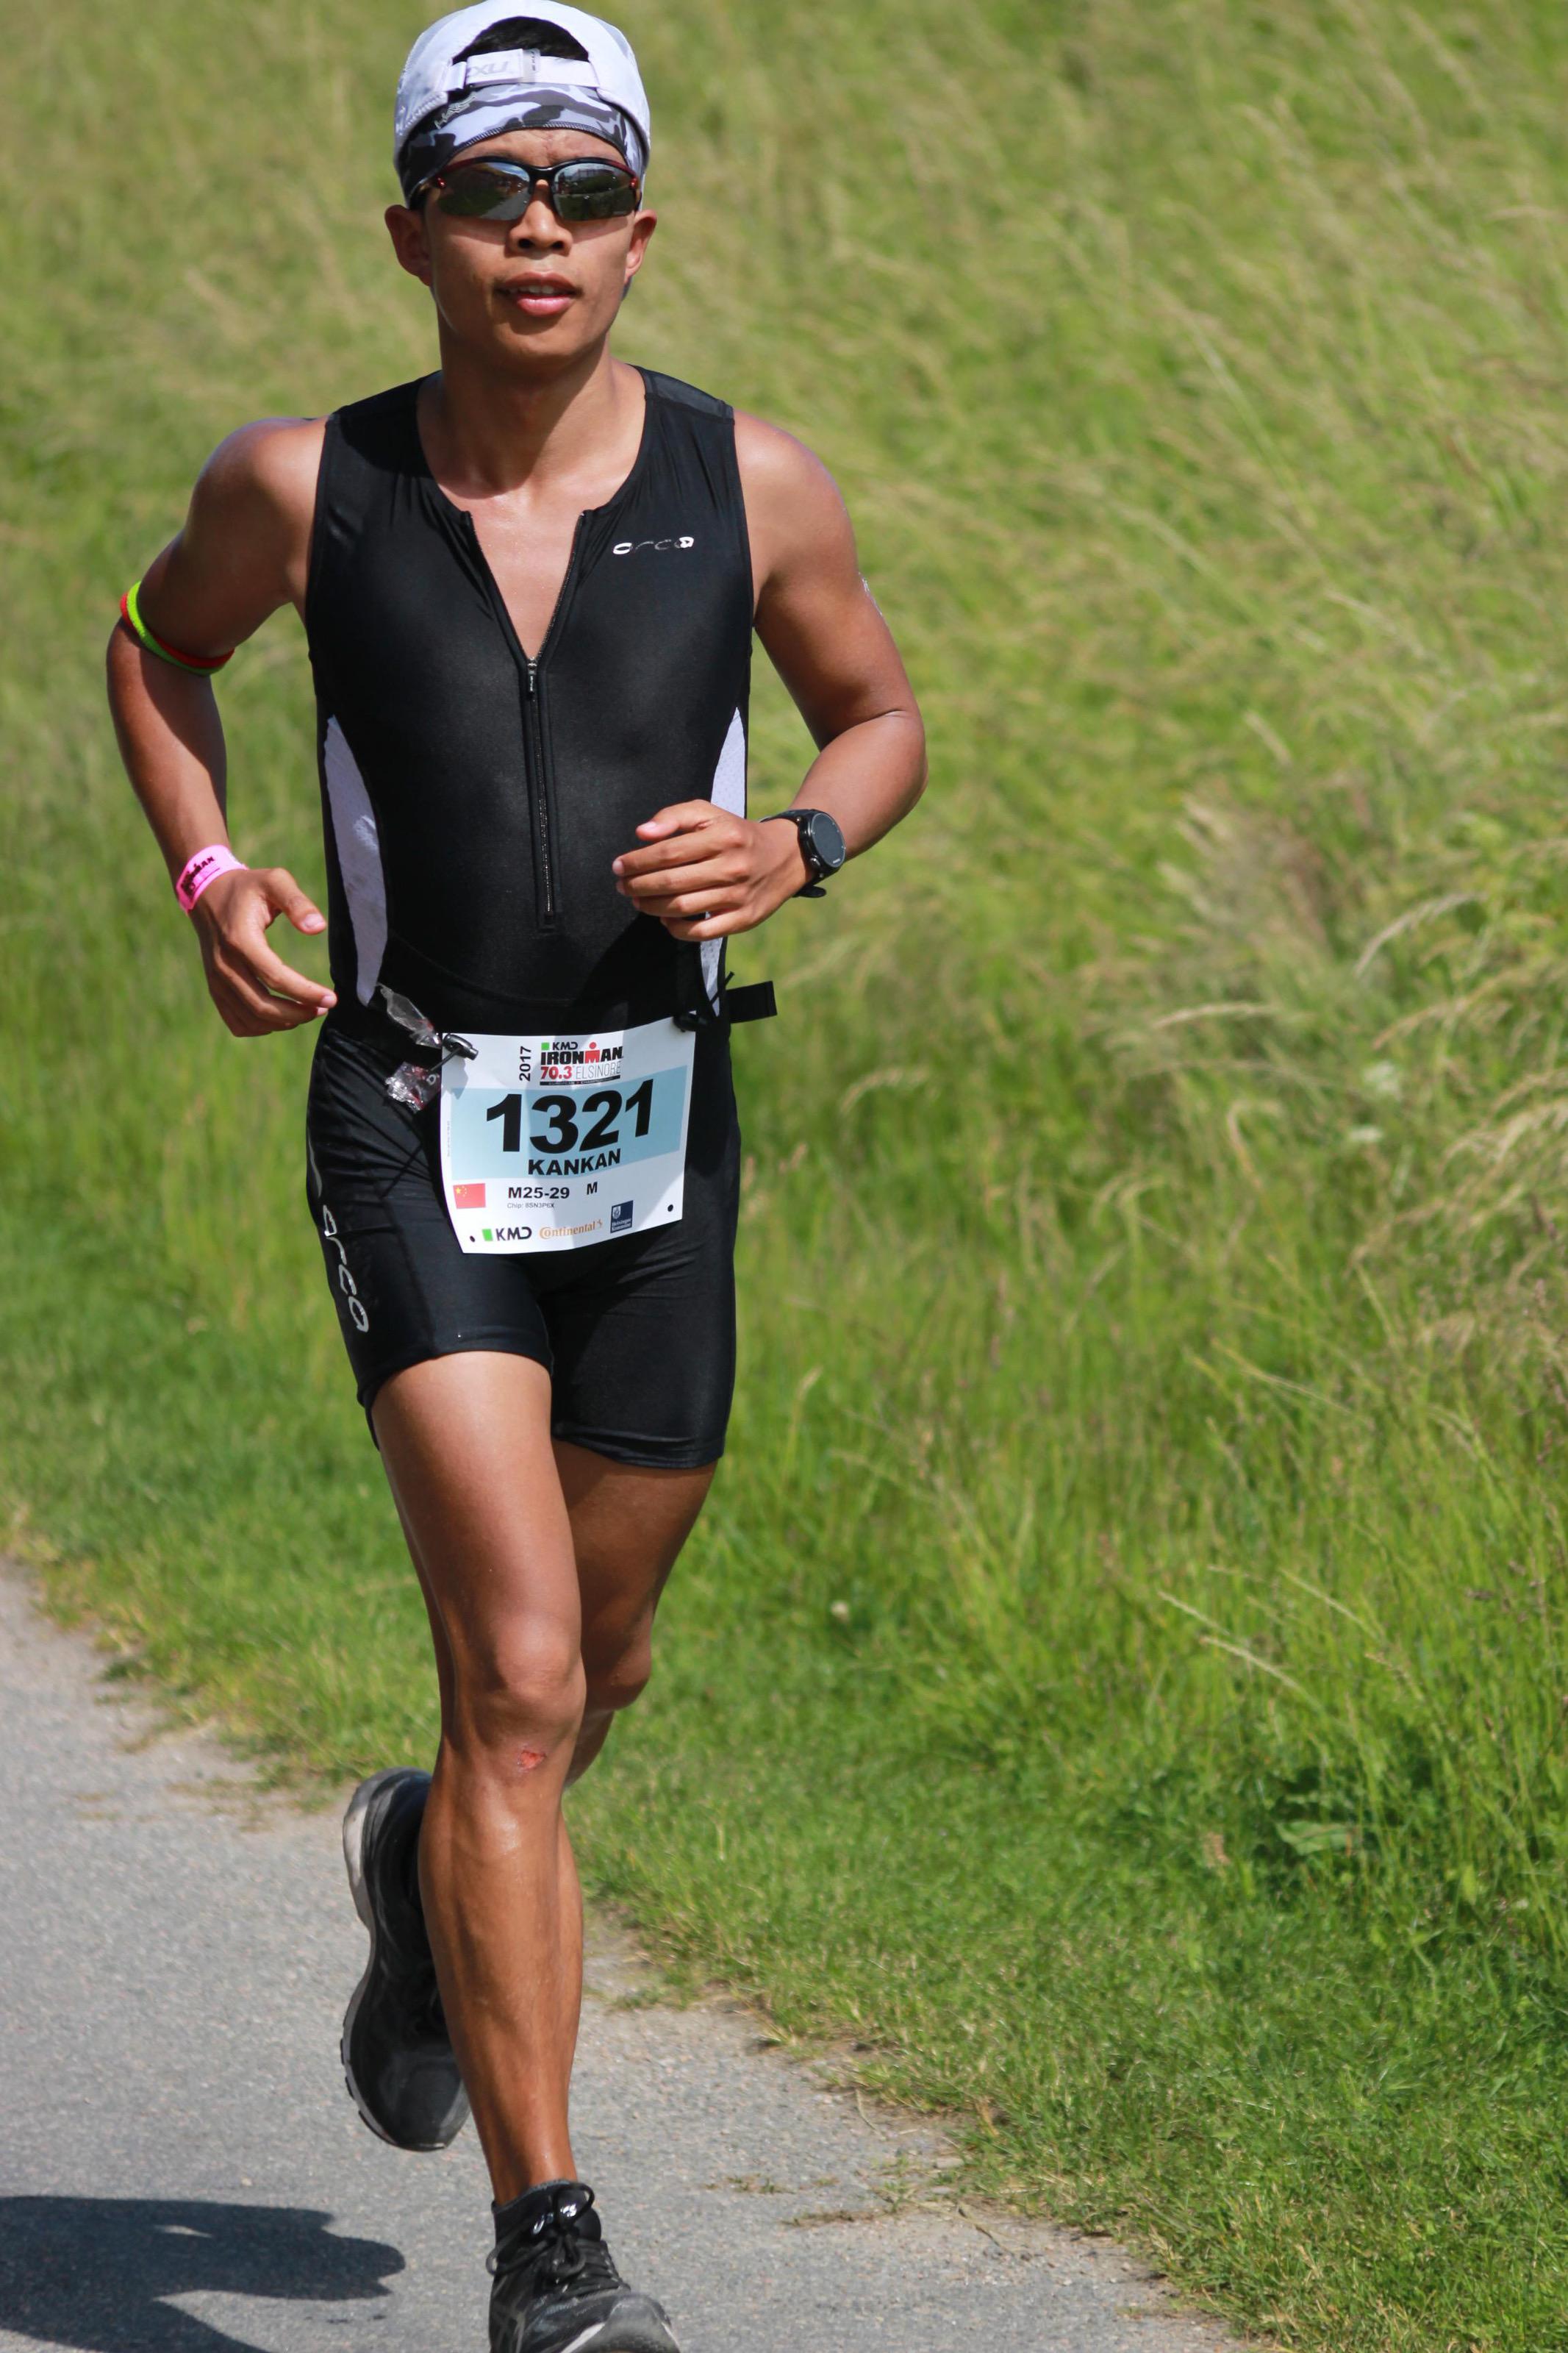 Ironman 70.3 Elsinore, Denmark